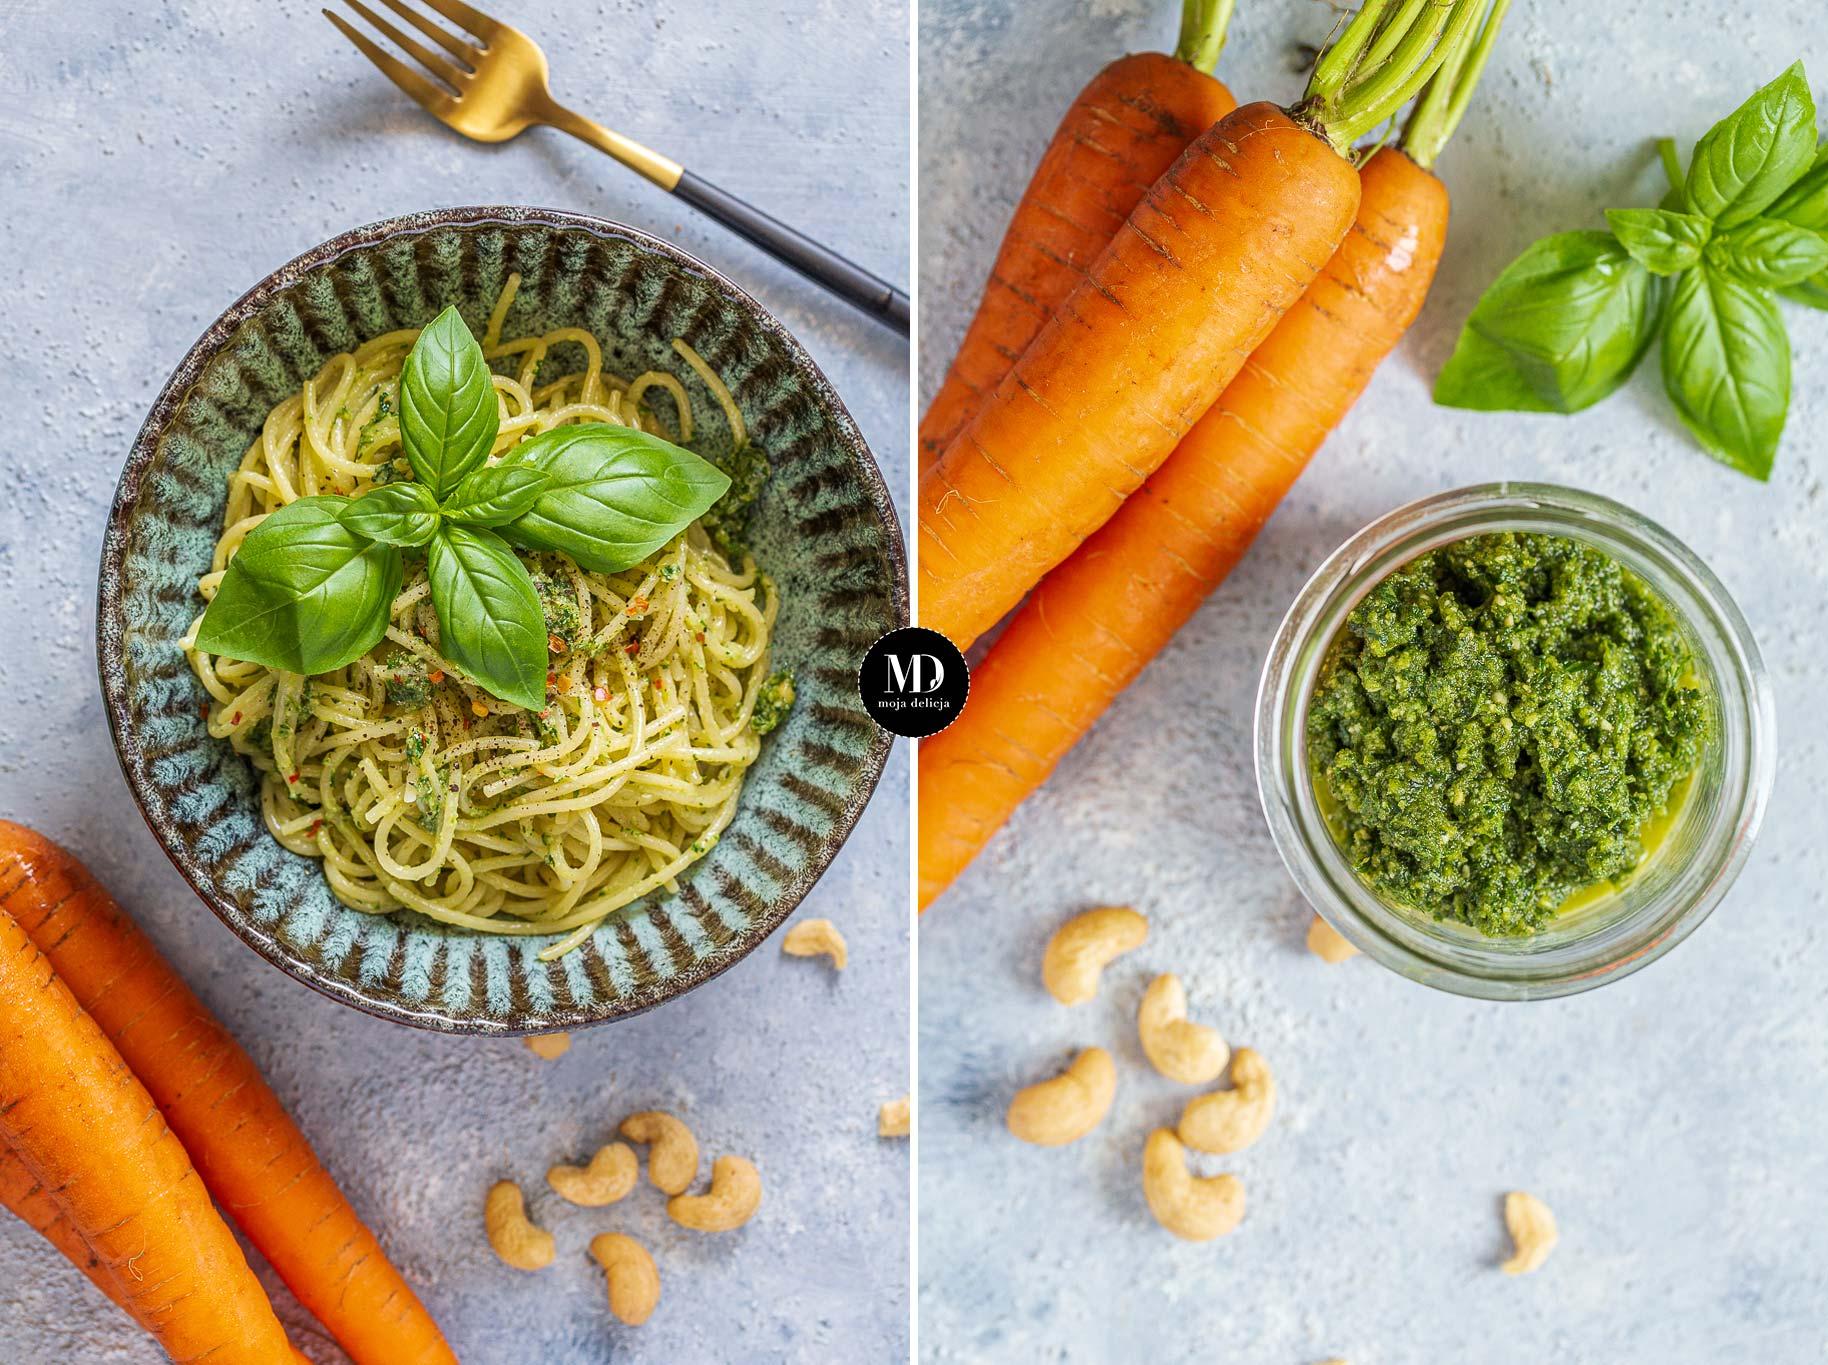 Makaron spaghetti z pesto z natki marchewki